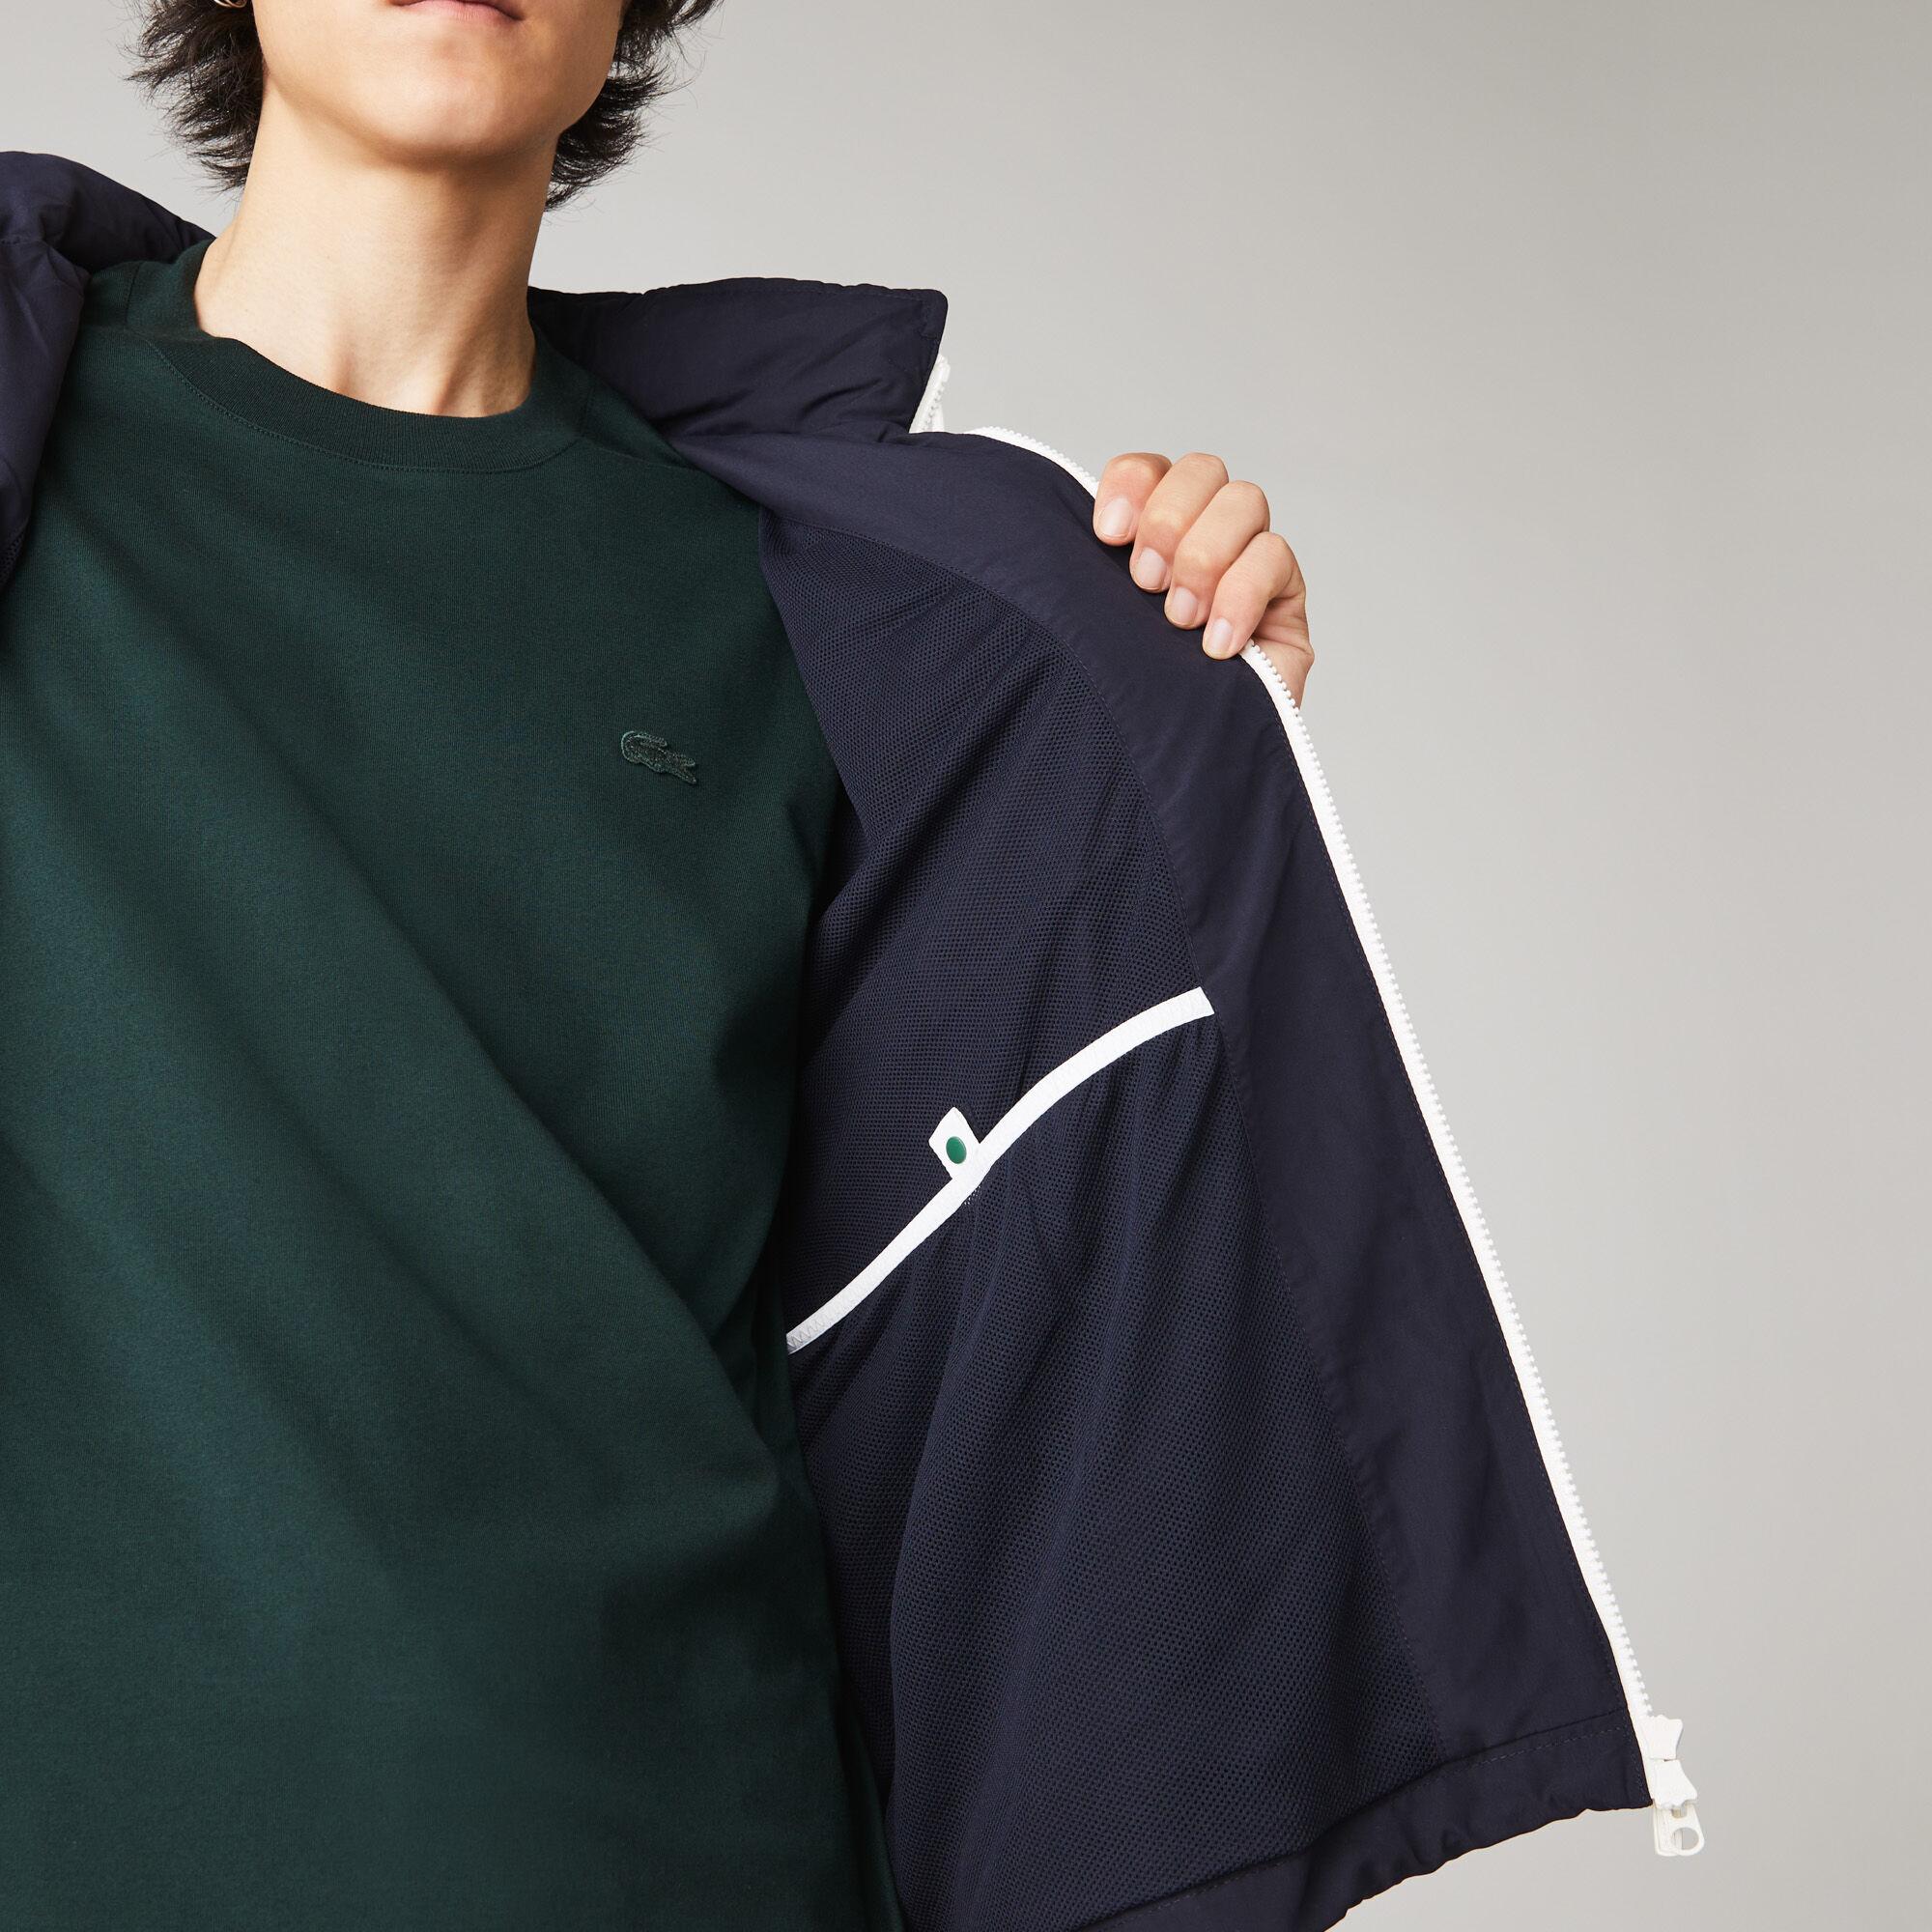 Men's Lightweight Water-Resistant Hooded Windbreaker